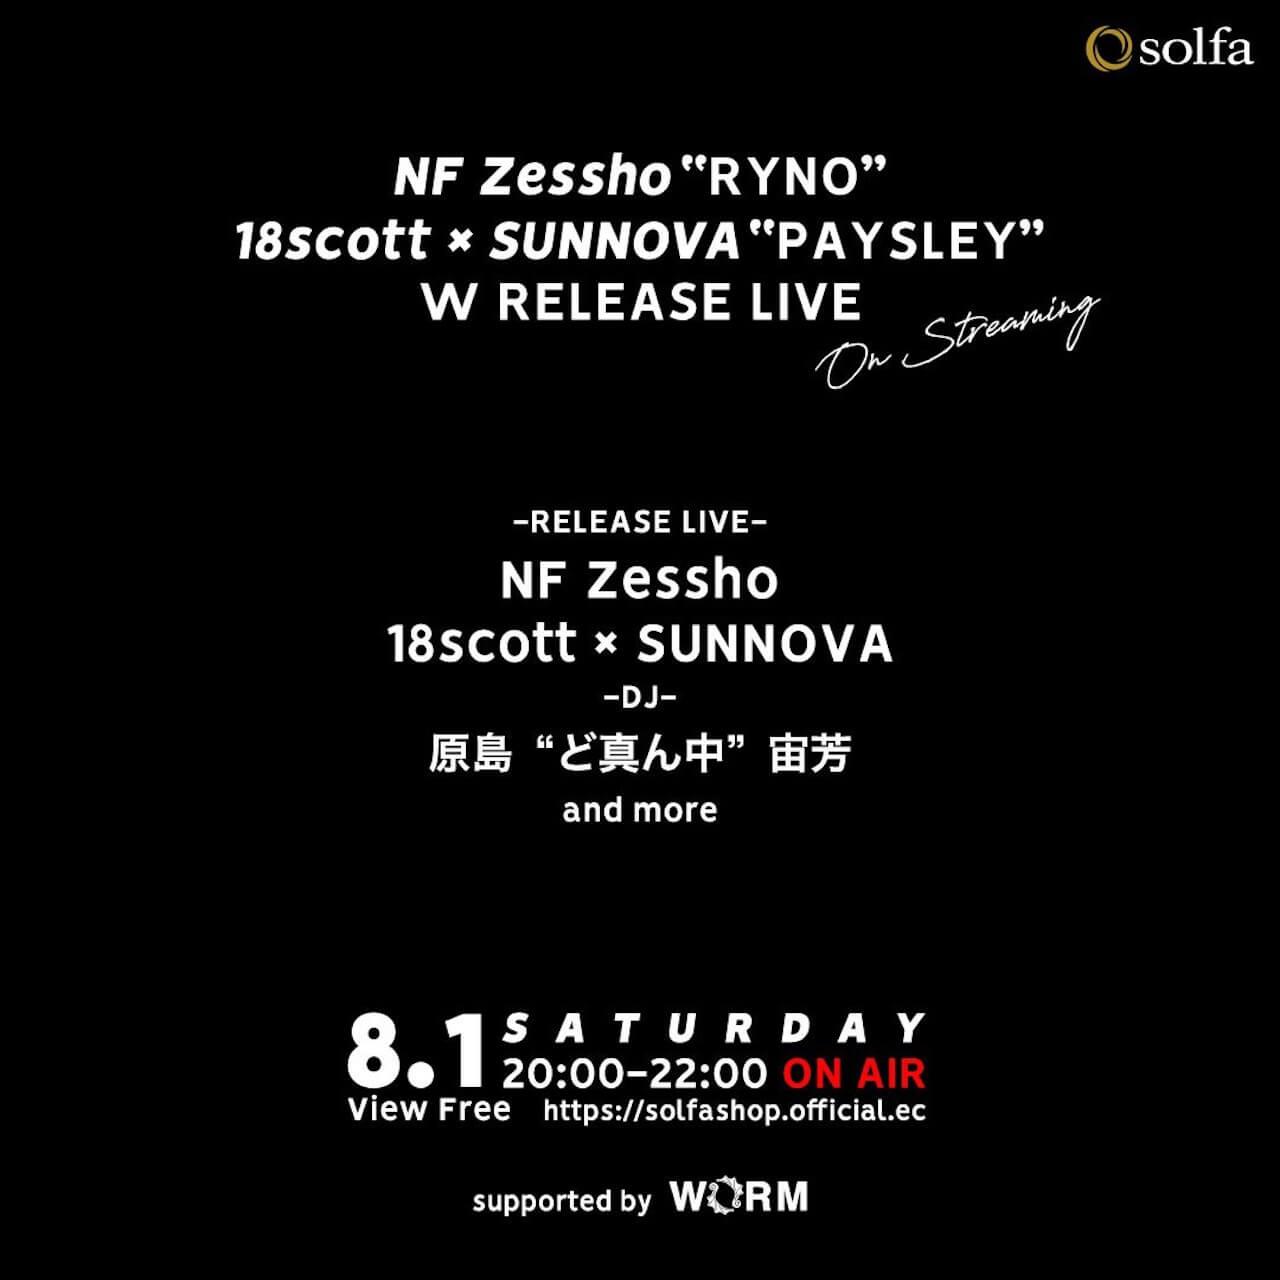 "NF Zesshoの新作EP『RYNO』と18scott&SUNNOVAによる2ndAL『PAISLEY』のWリリース・パーティーがWORM Tokyoのサポートを受け配信決定 DJには原島""ど真ん中""宙芳も music200729-nfzessho-18scott-sunnova"